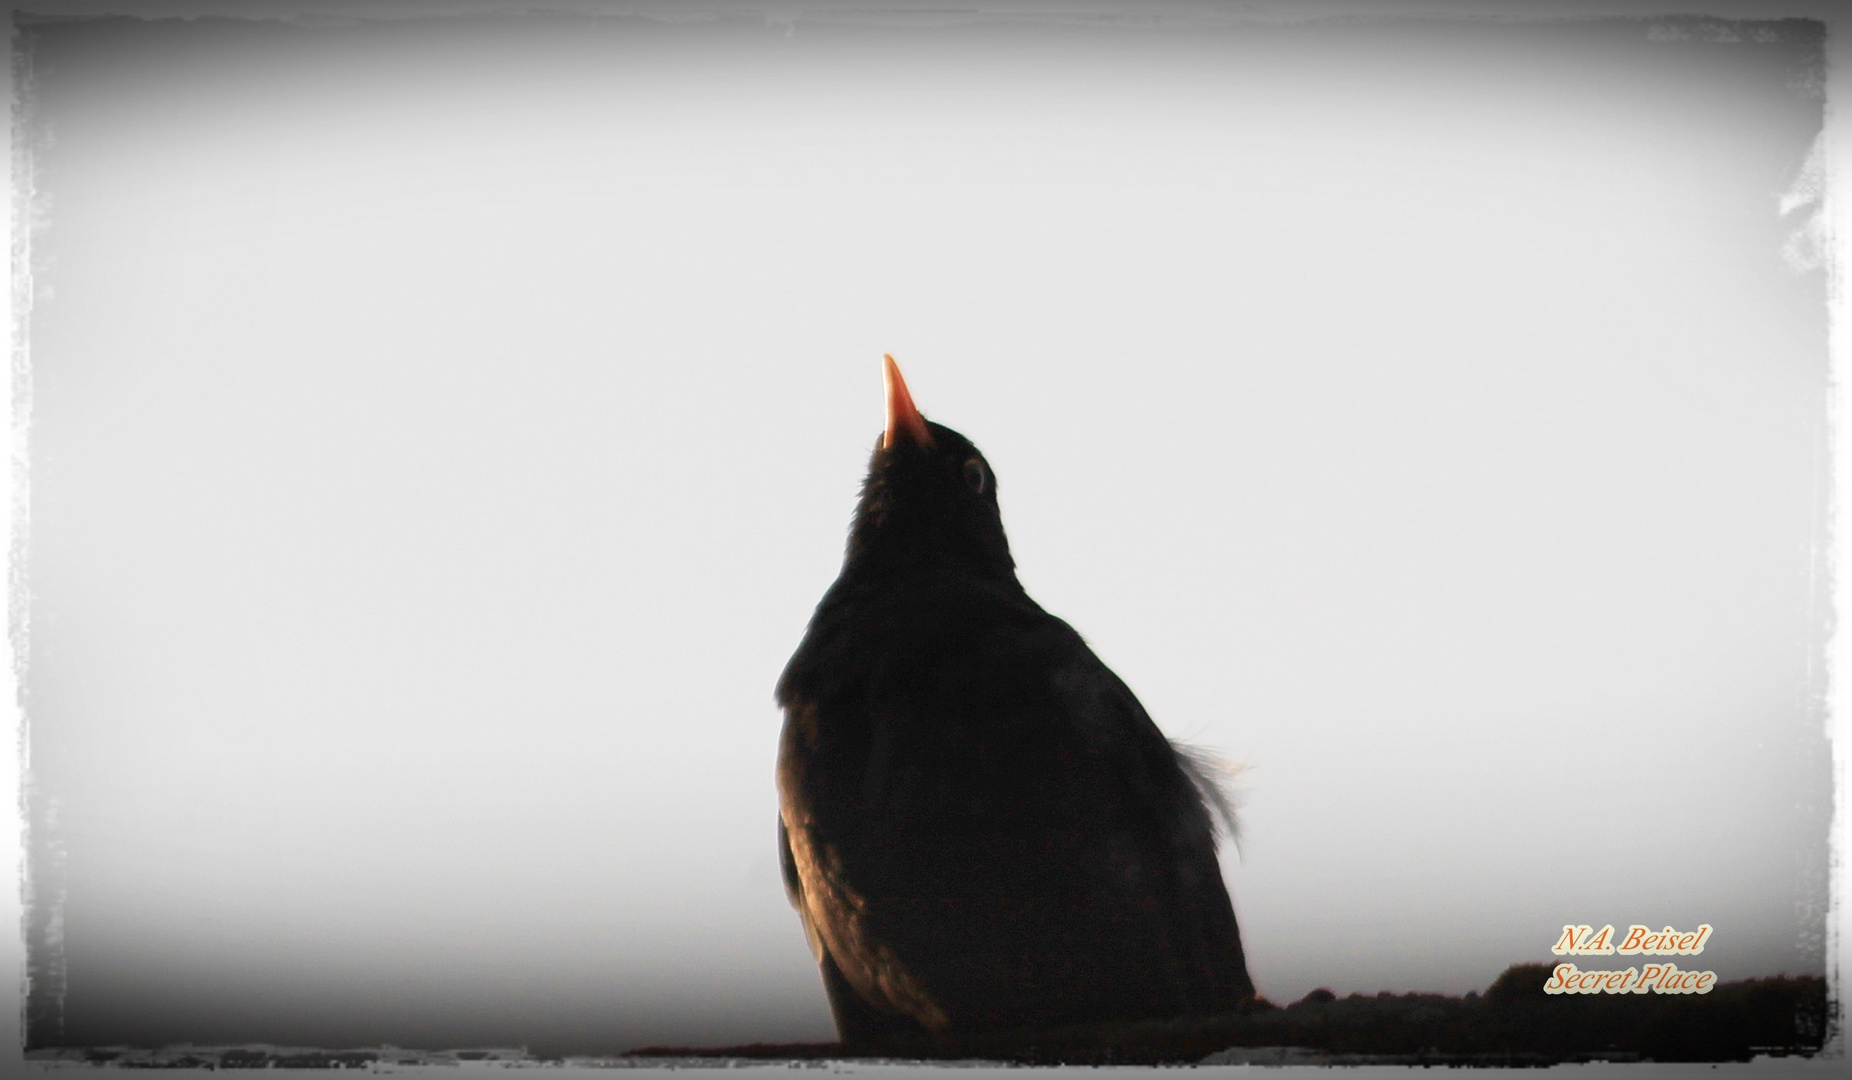 When The Black Bird sings Hallelujah :)